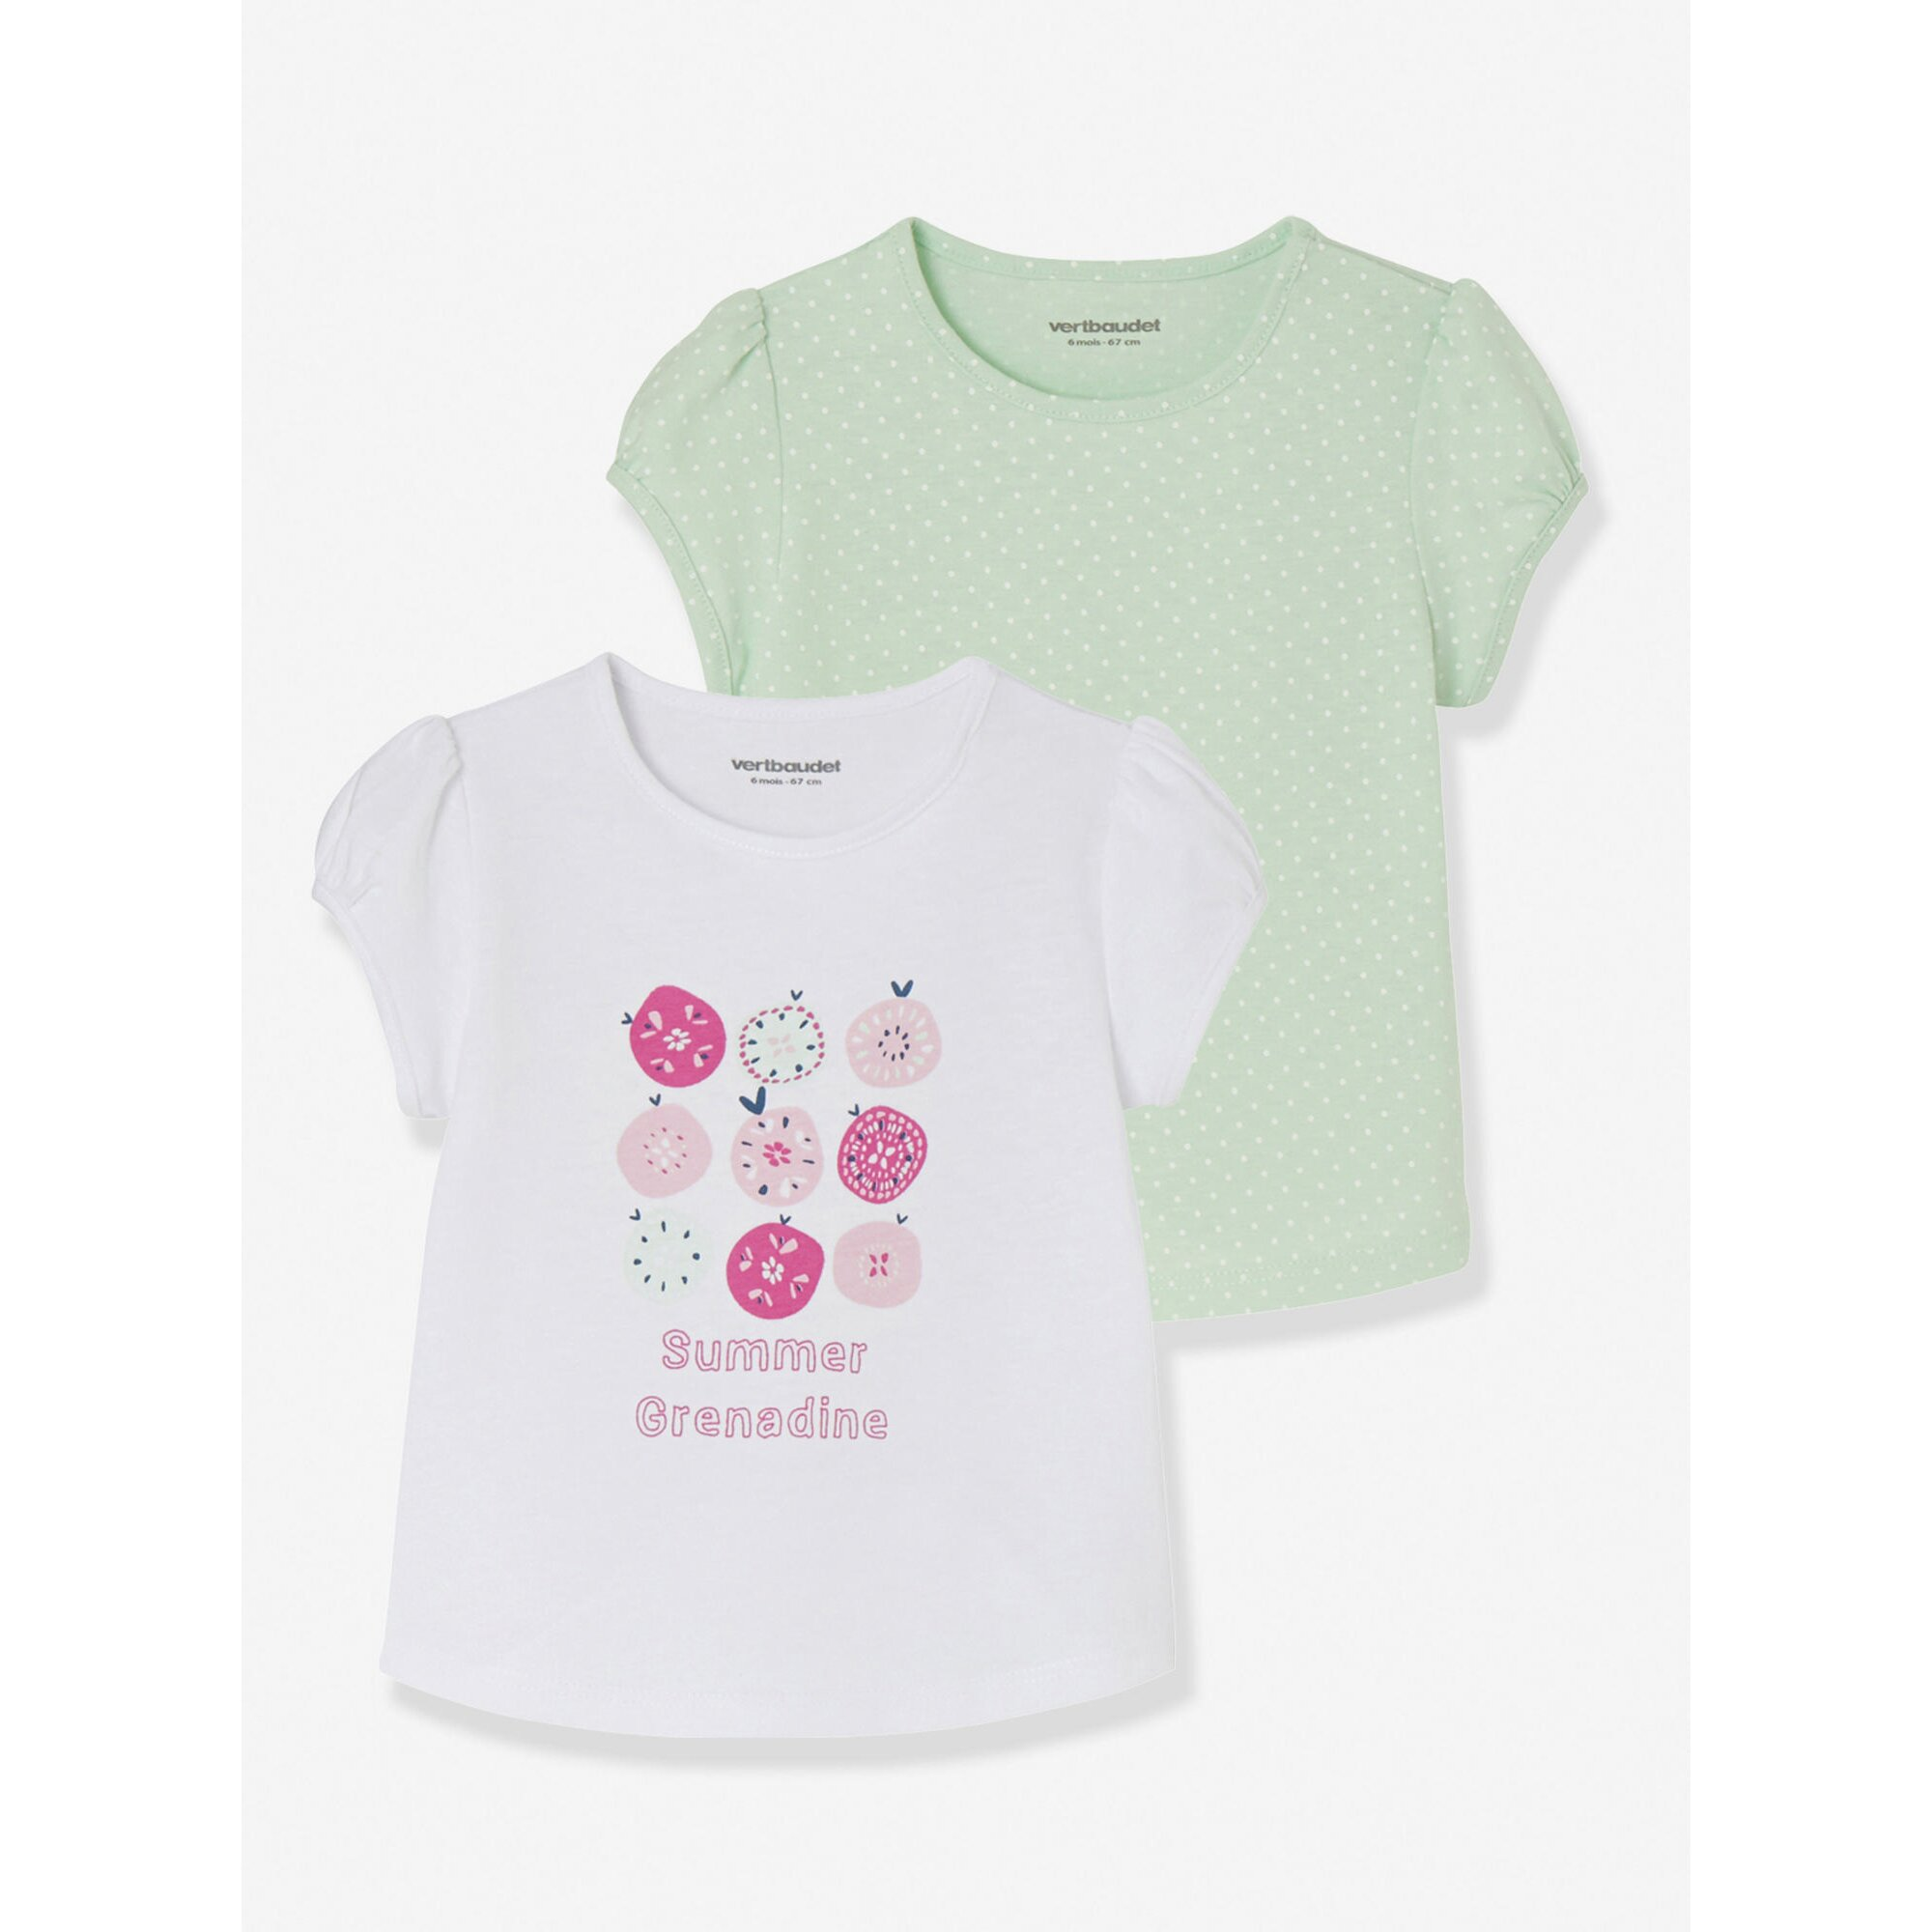 vertbaudet-2er-pack-baby-madchen-t-shirts